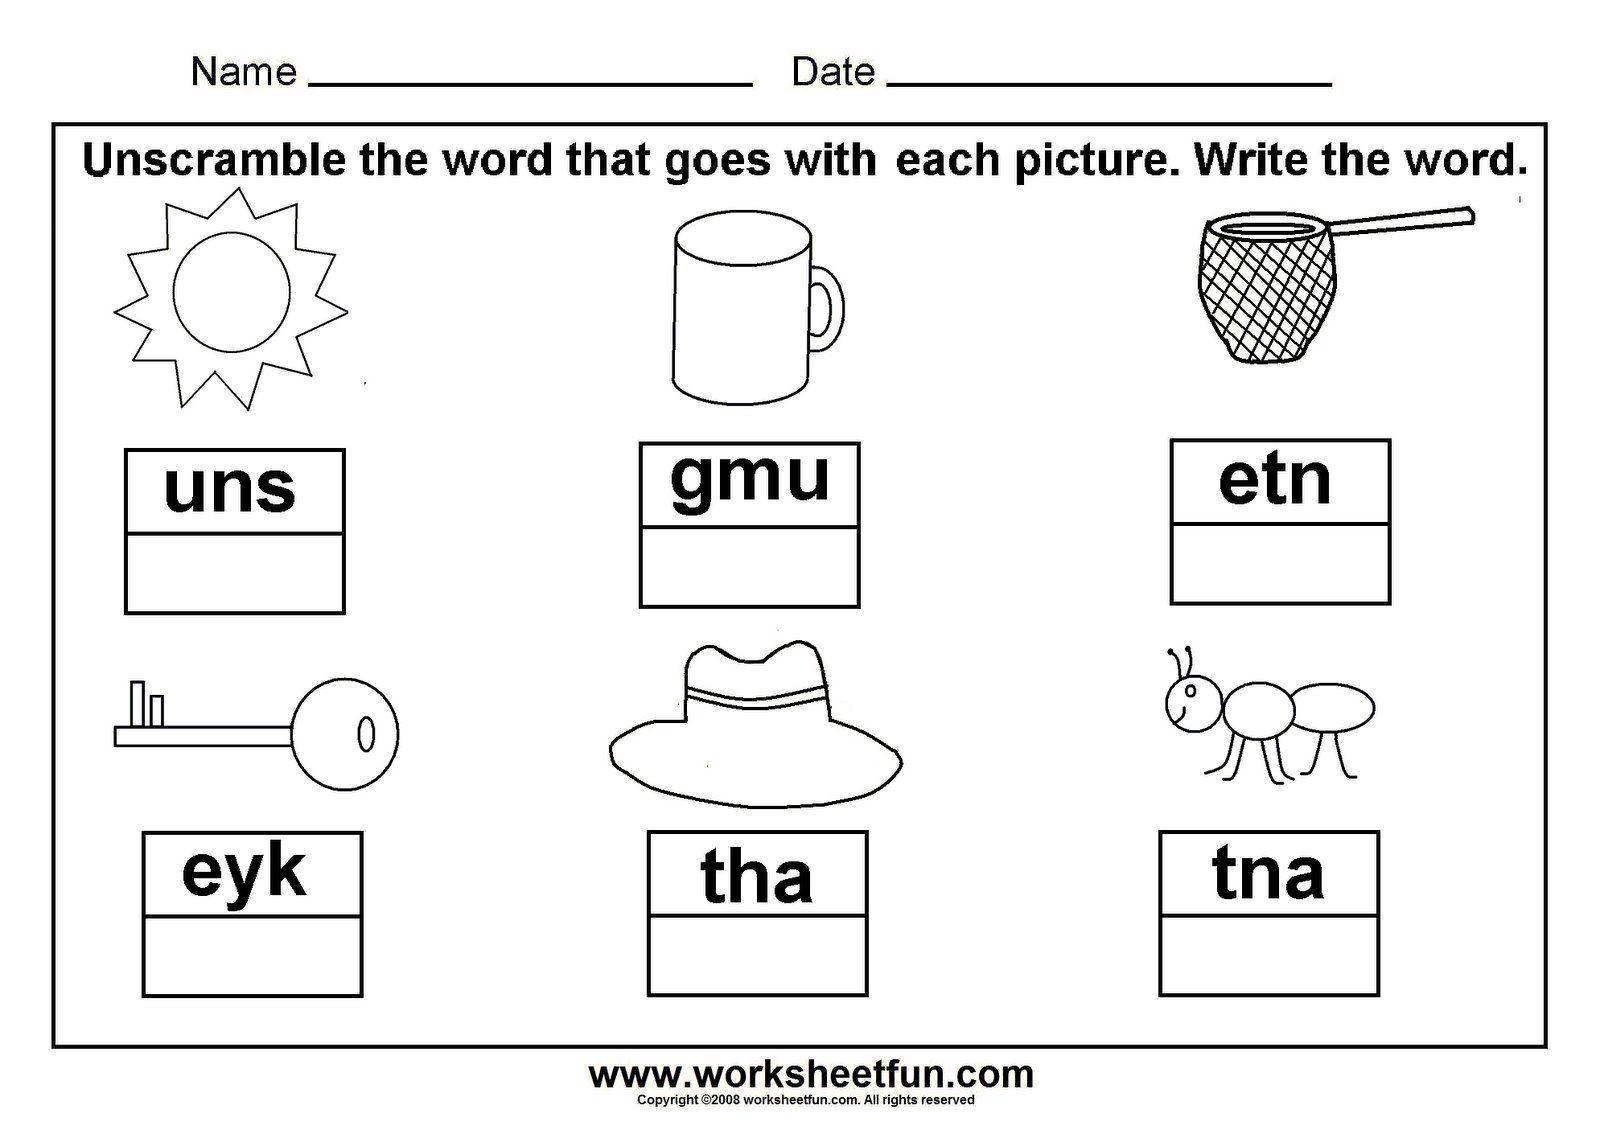 Unscramble The Word Worksheet 1p